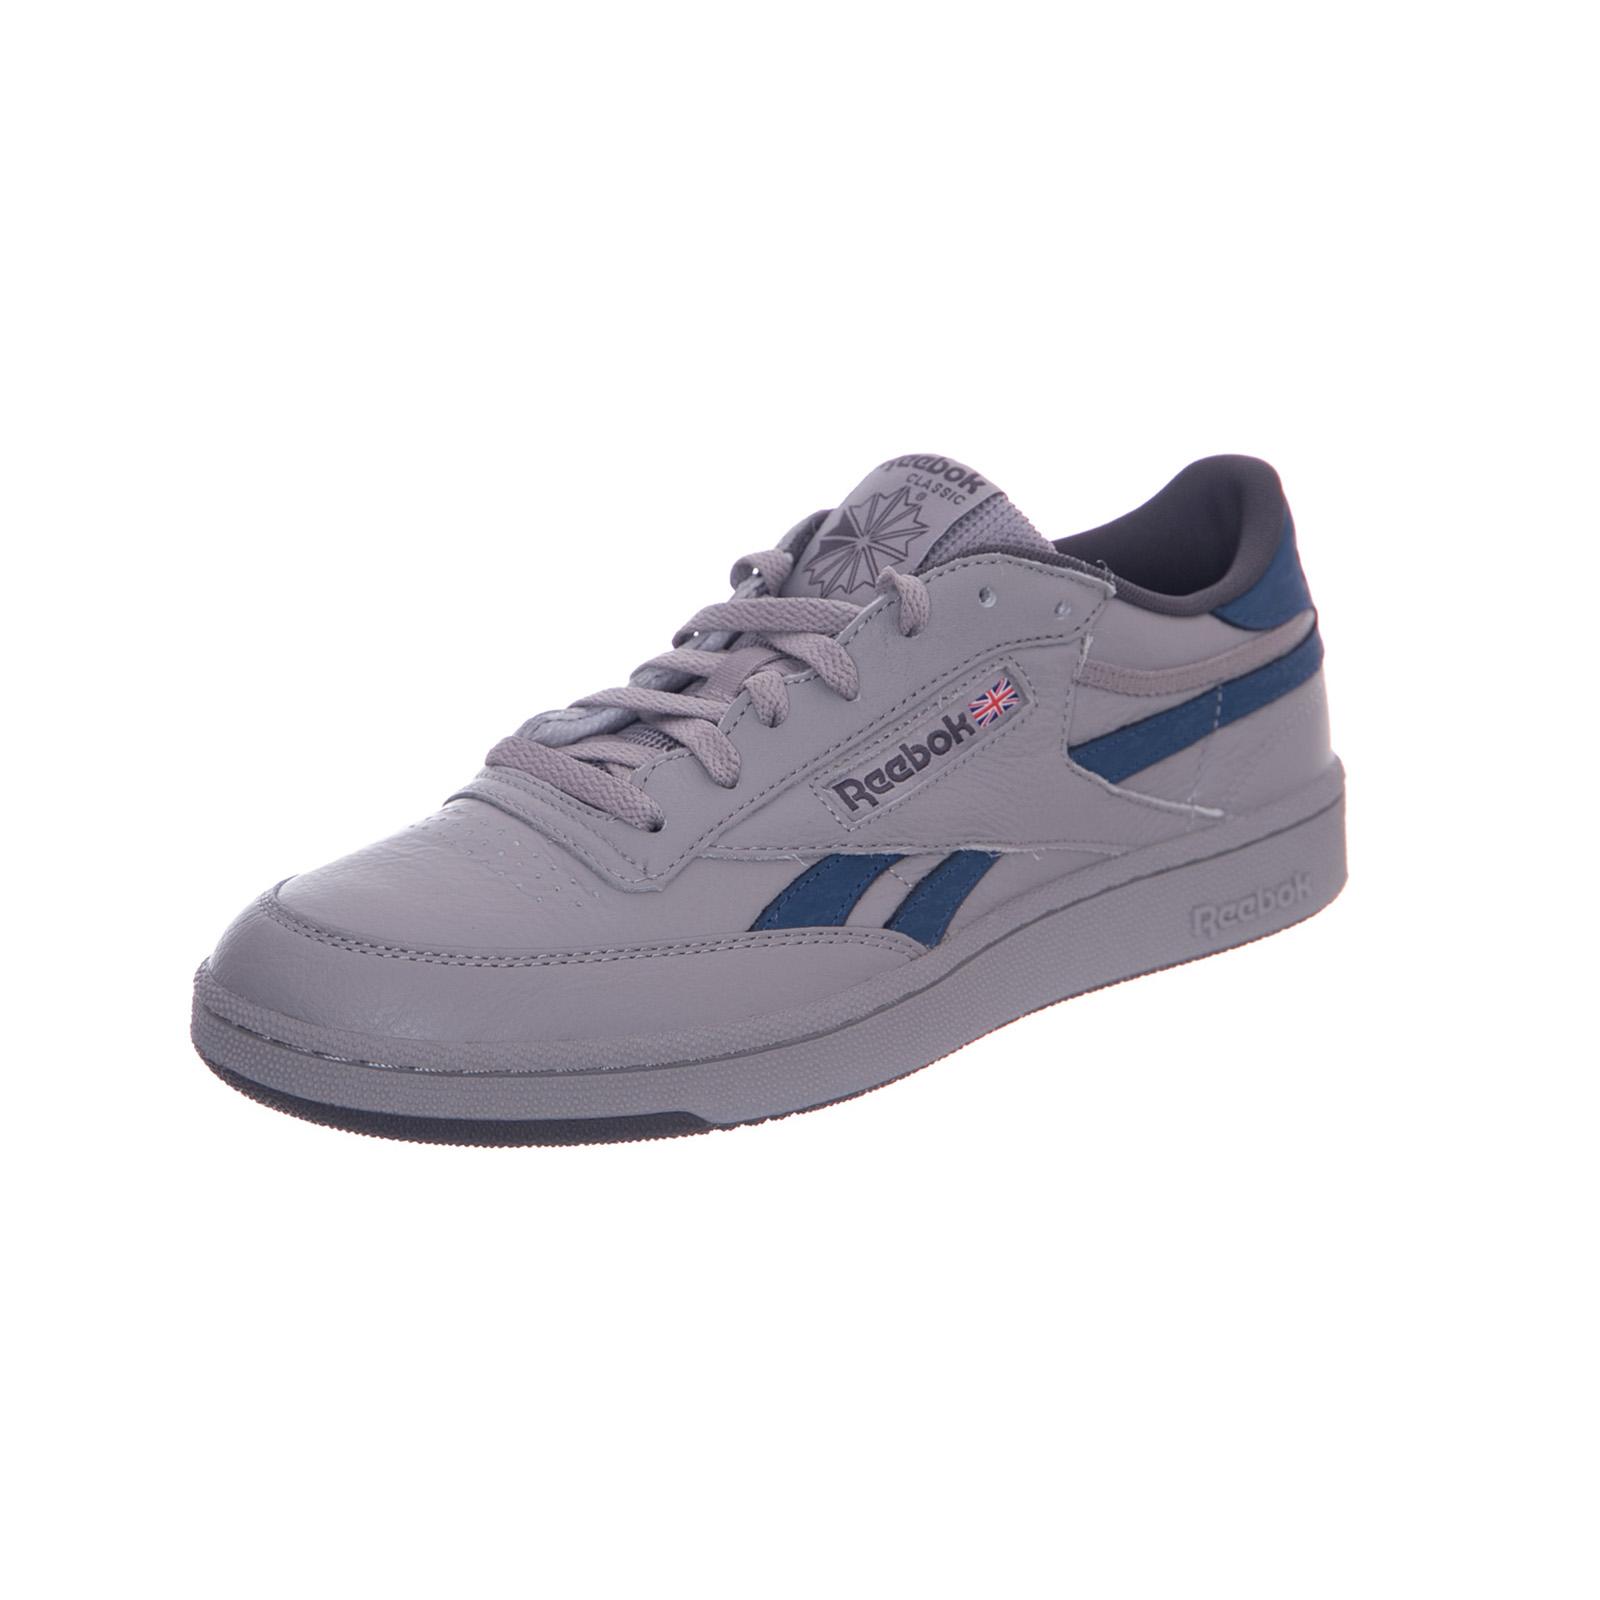 Reebok Gris Blanc Etain Grigio Plus Bleu Revenge Sneakers r8aqrPIf